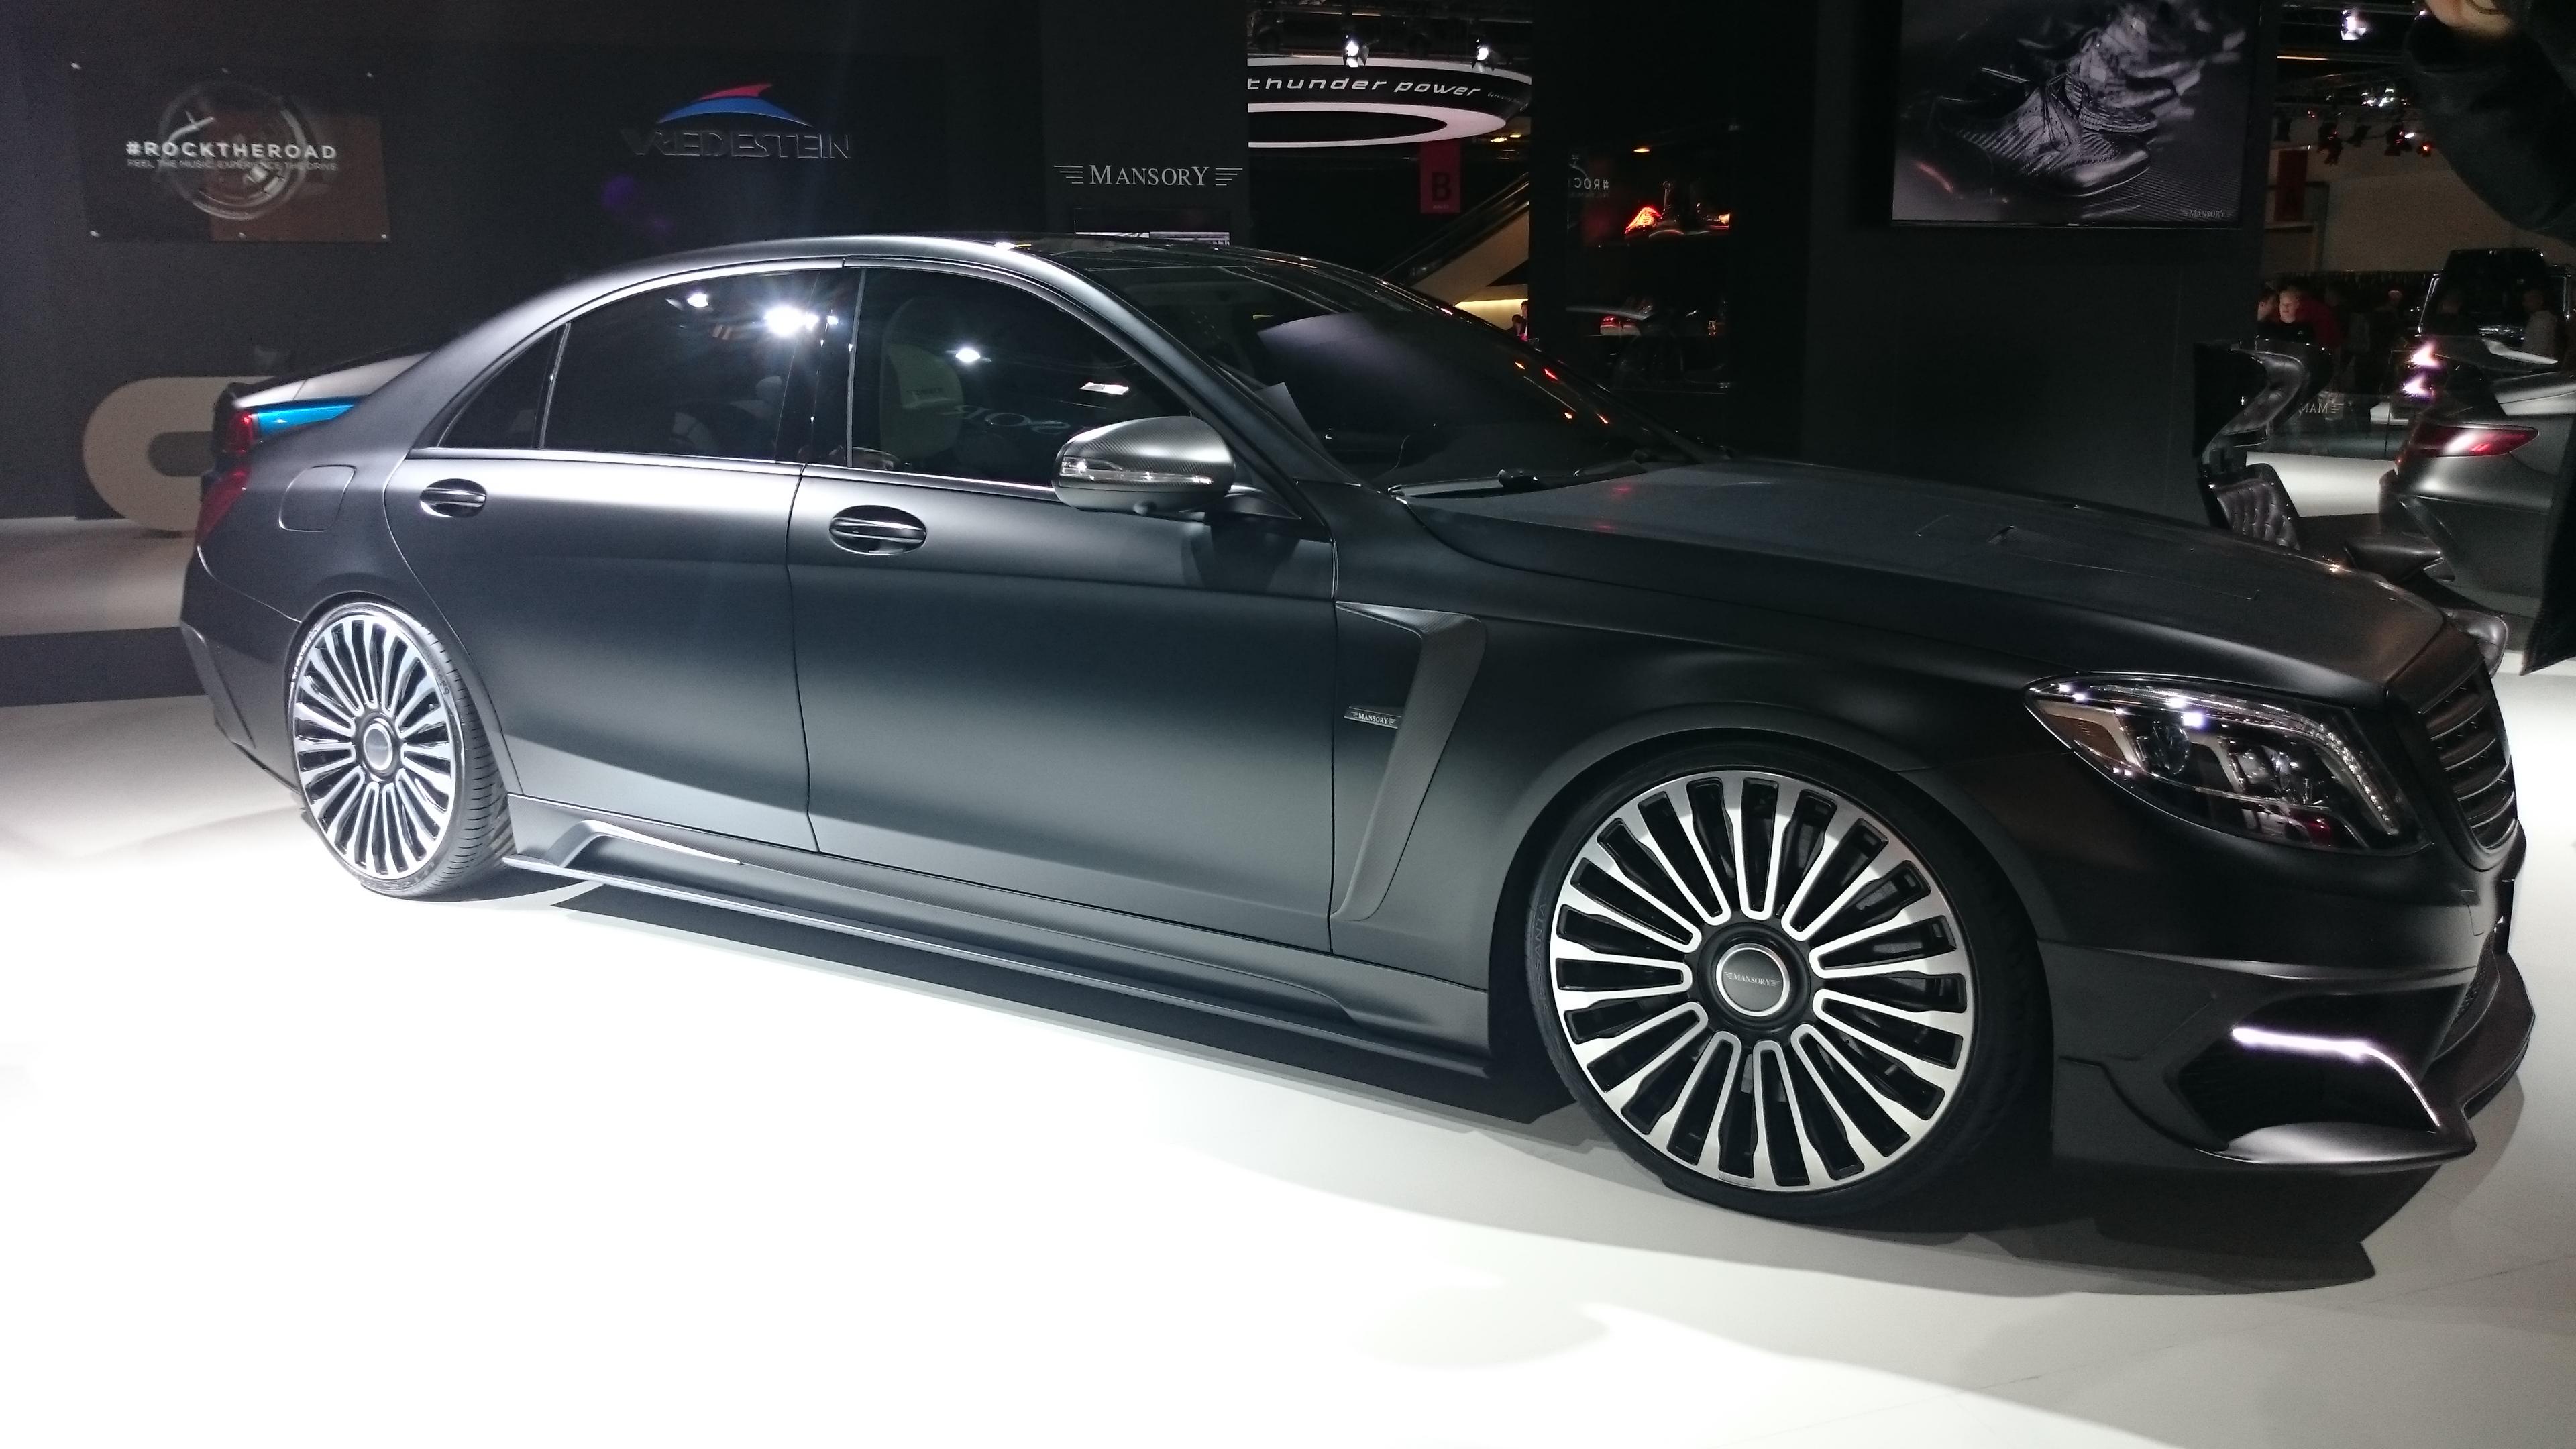 Fotos 360 del Mercedes-Benz S63AMG L MANSORY Black Edition #VidePan en #IAA2015